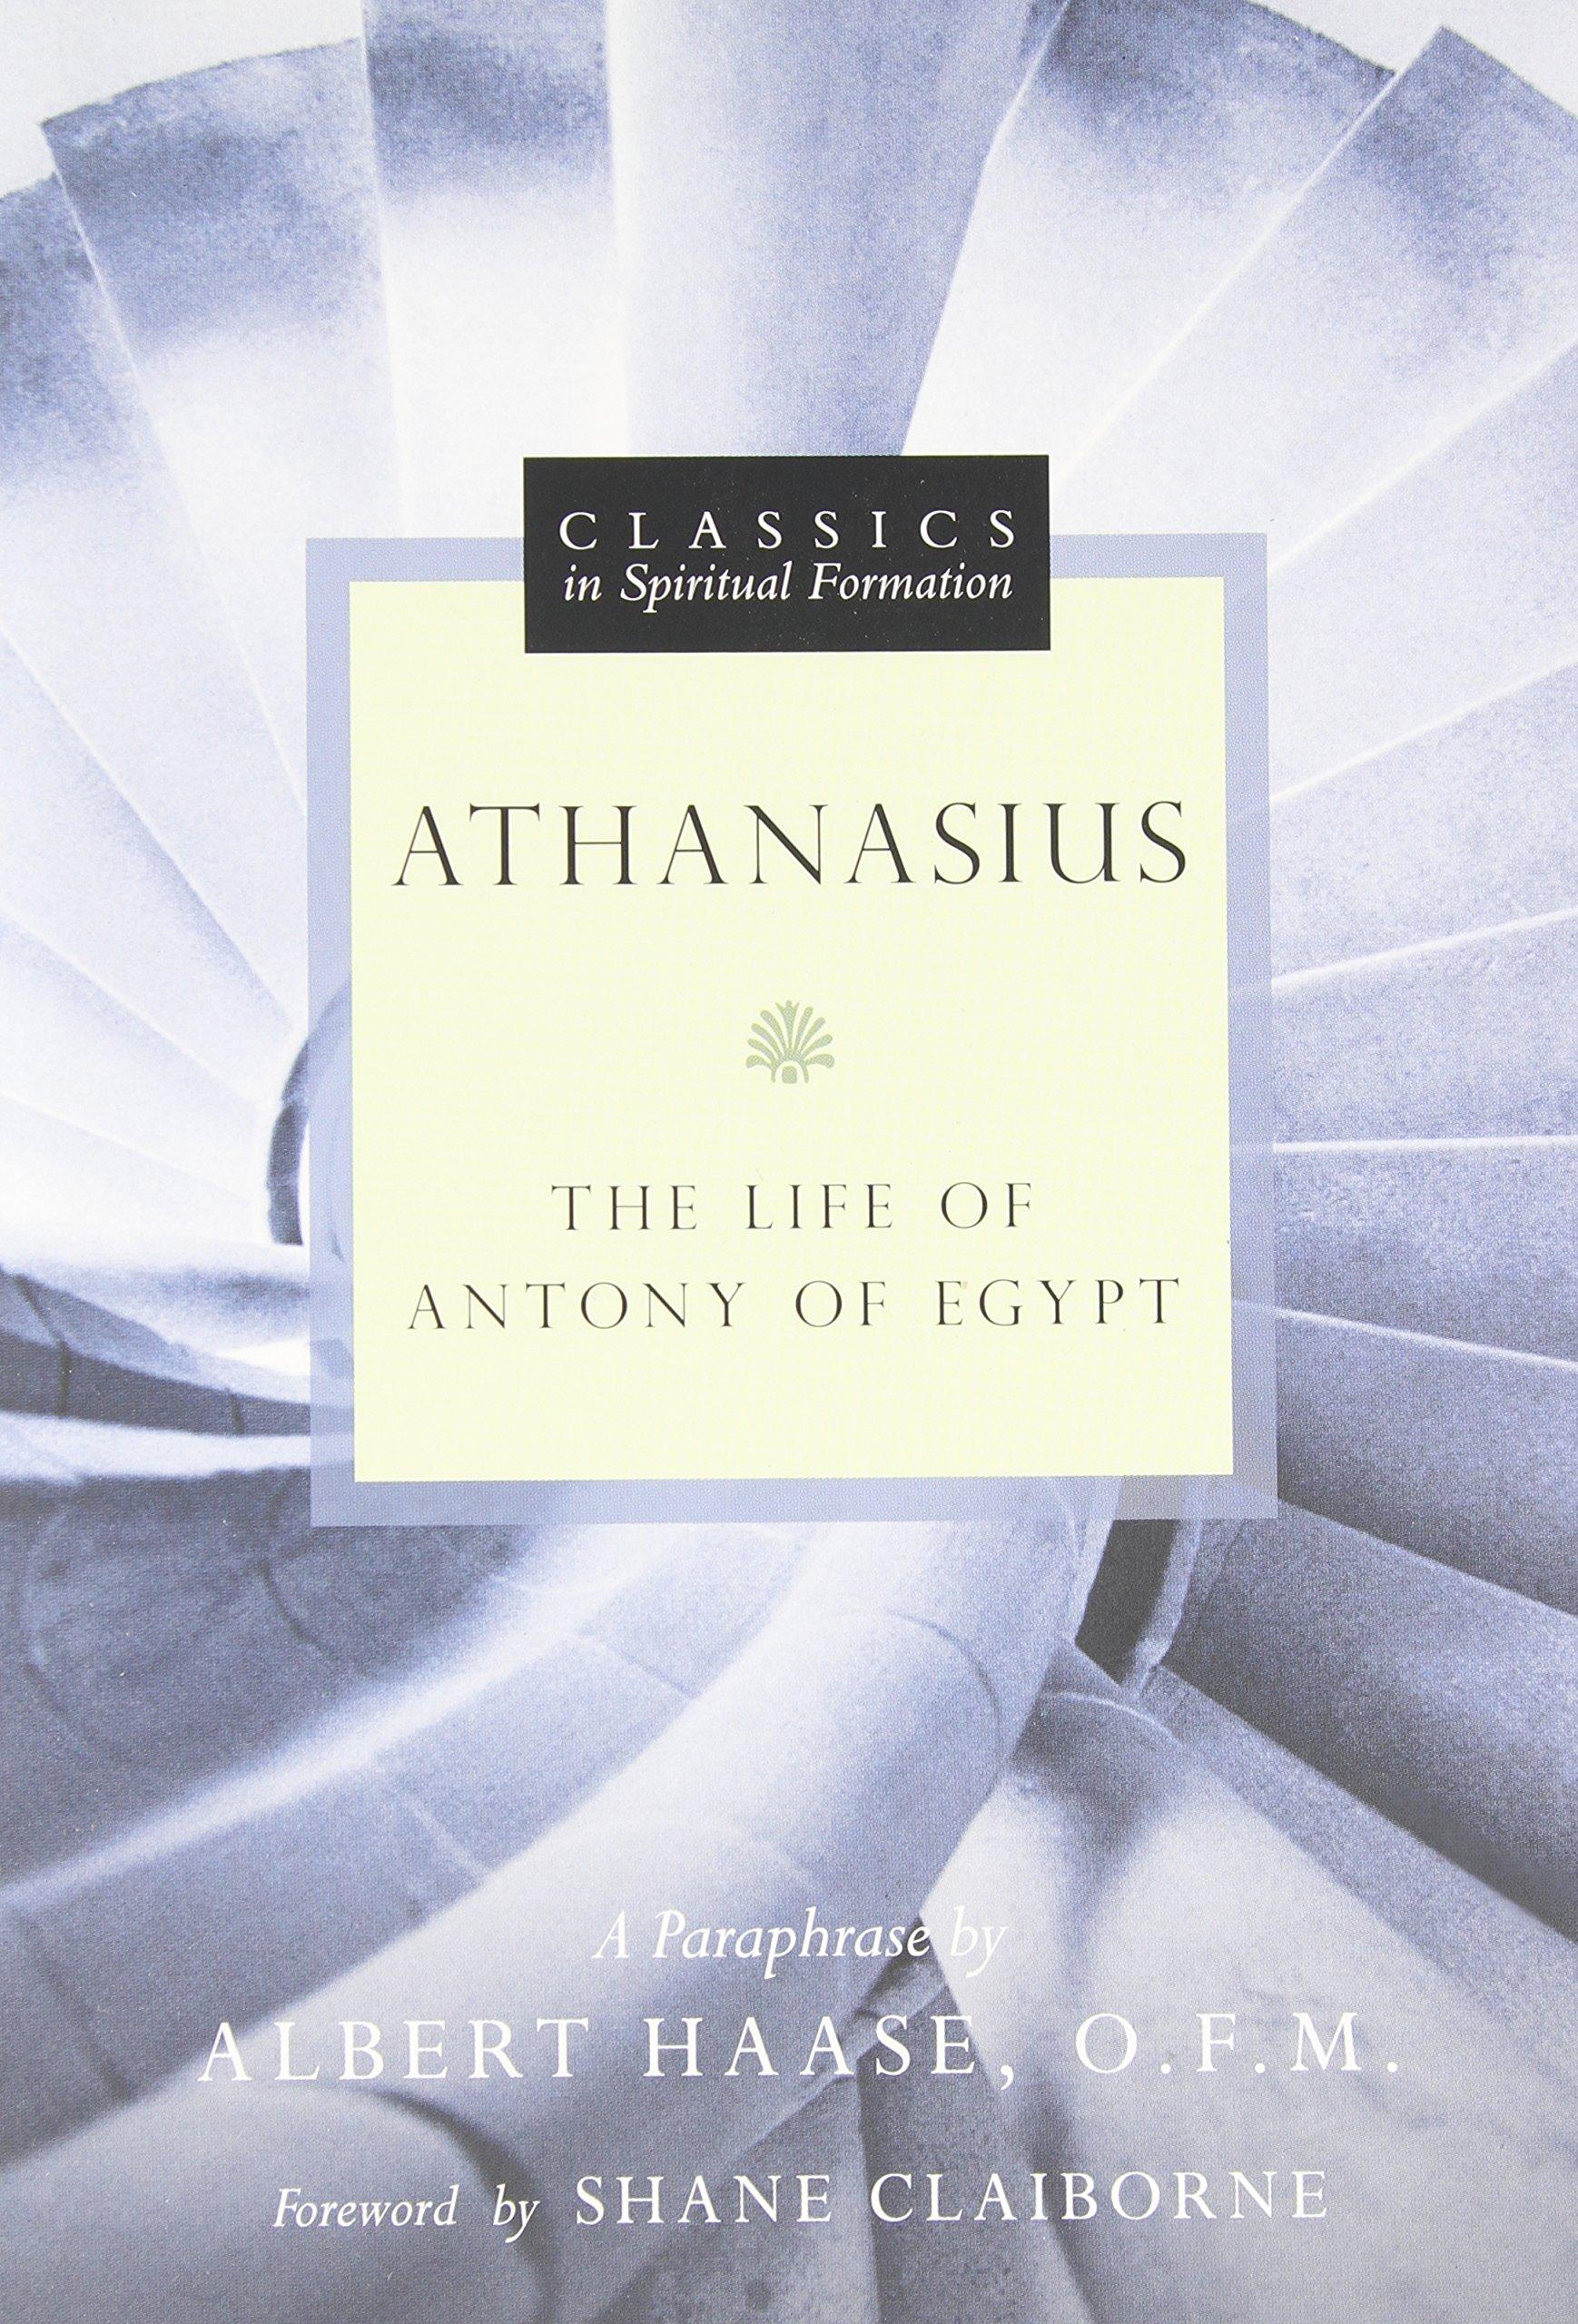 Read Online Athanasius: The Life of Antony of Egypt (Classics in Spiritual Formation) pdf epub